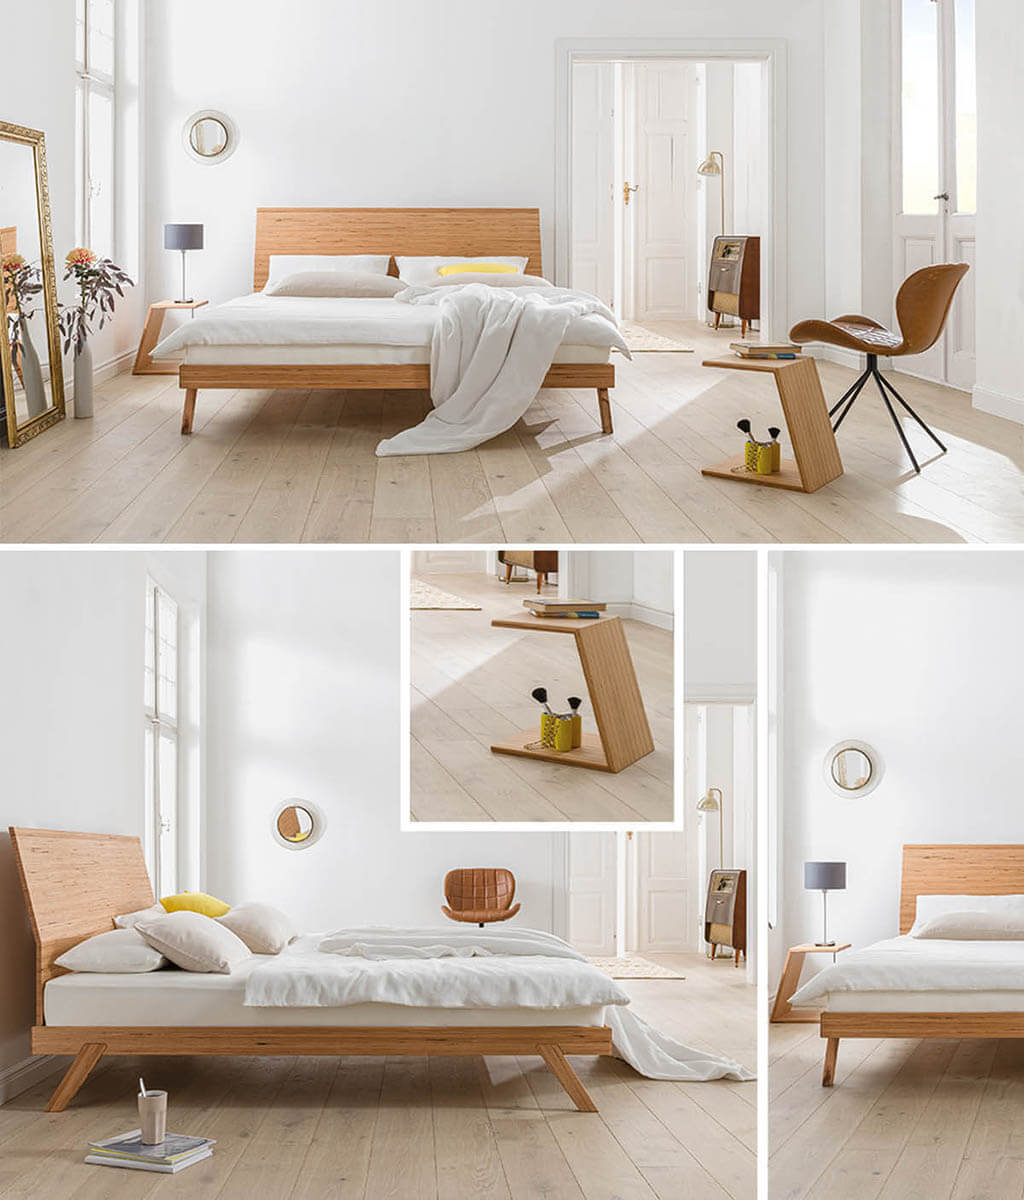 dormiente-Massivholzbett-Laria-Betten-Massivholz-kaufen